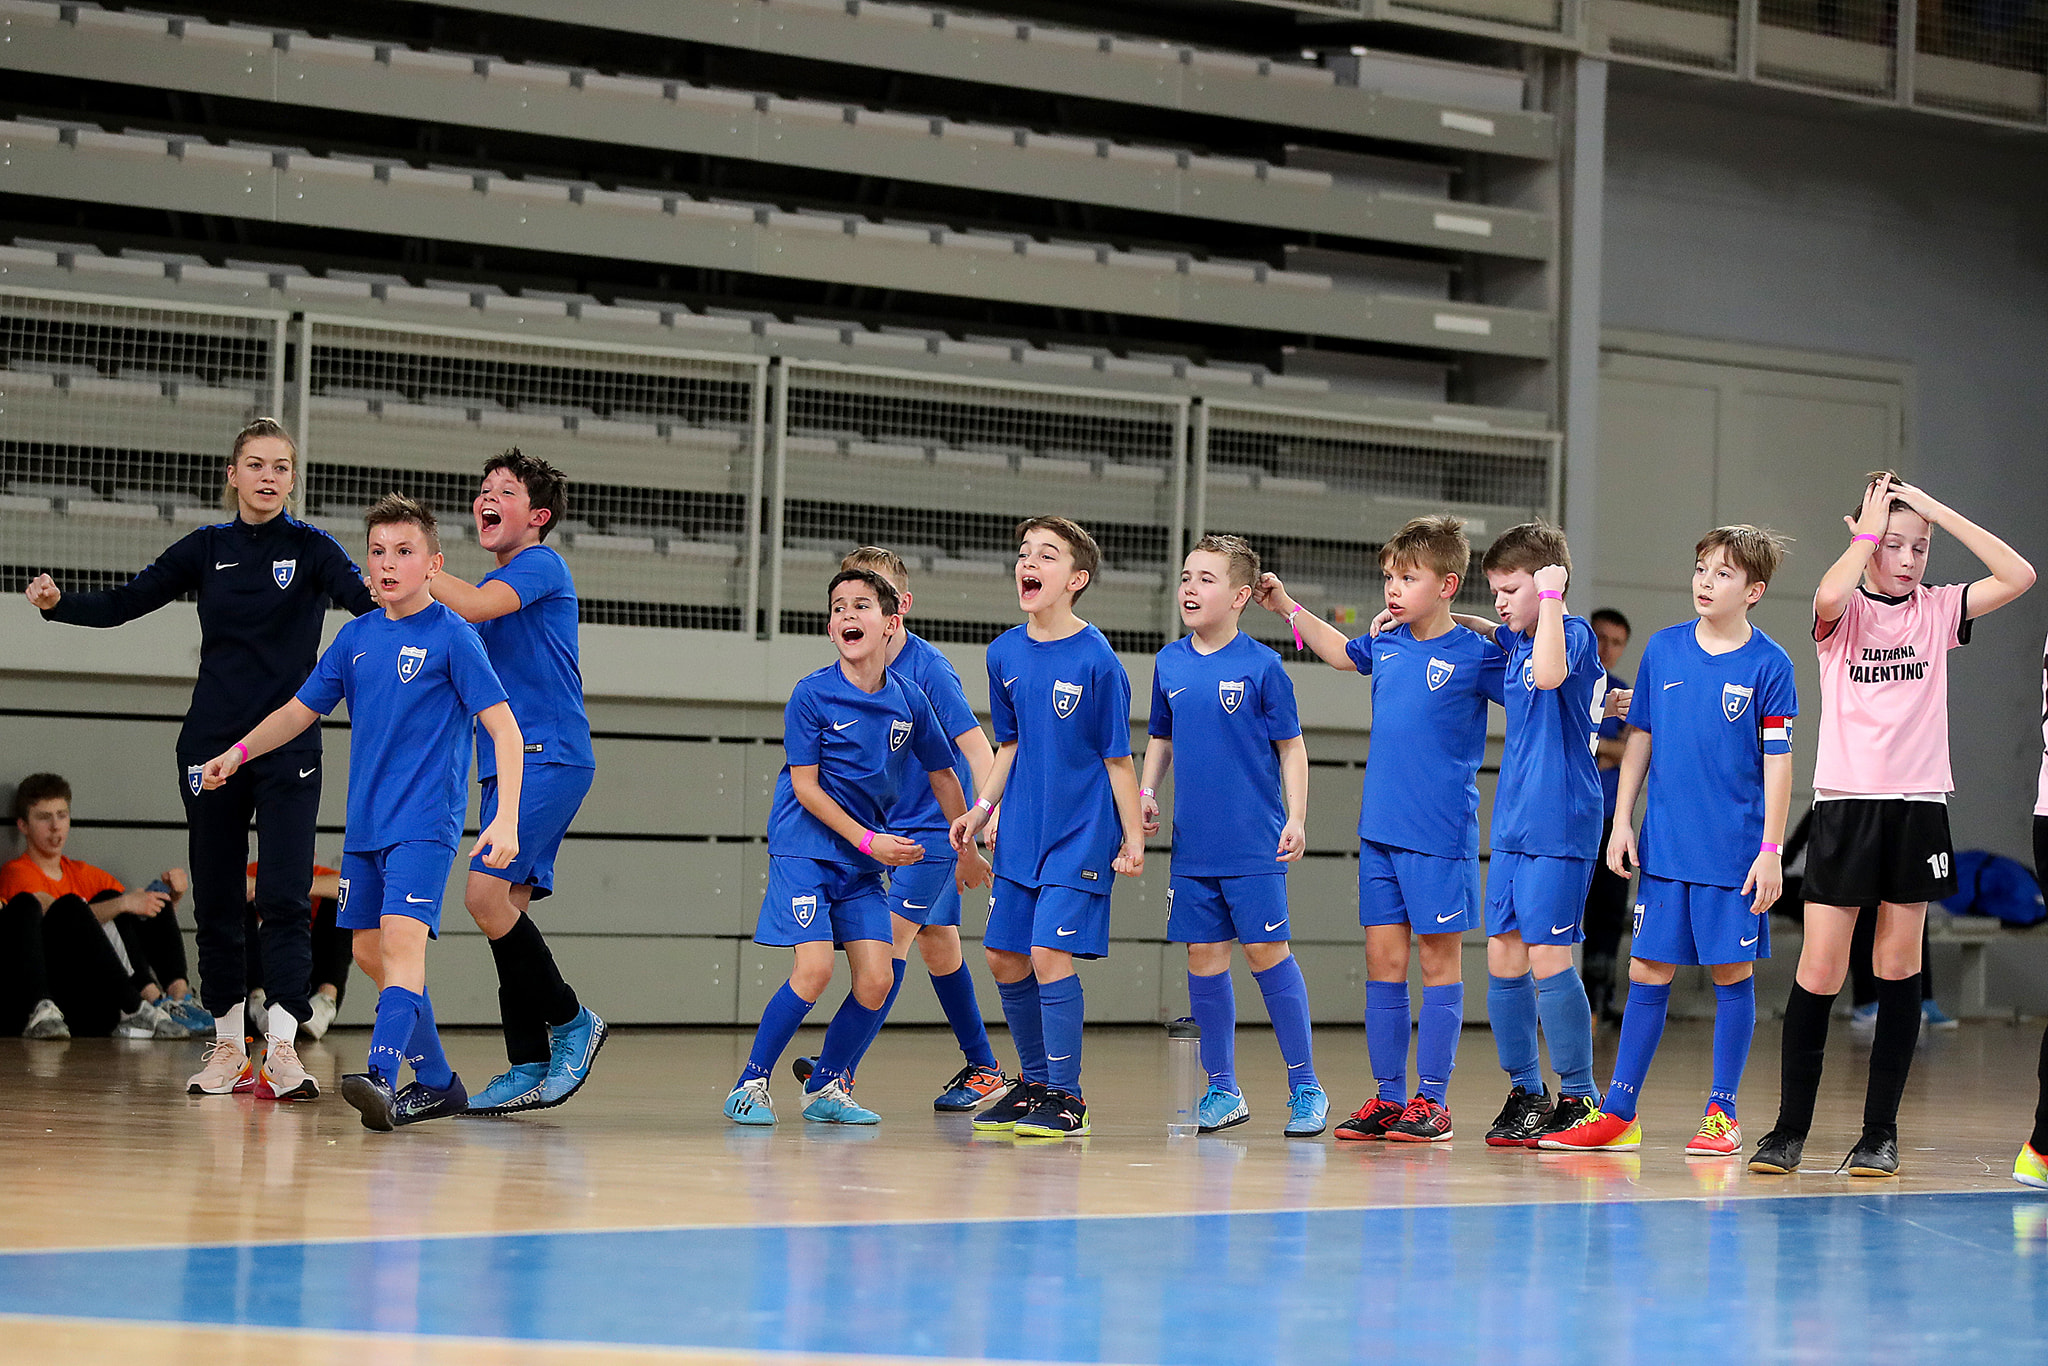 sport - razvoja djetetova karaktera